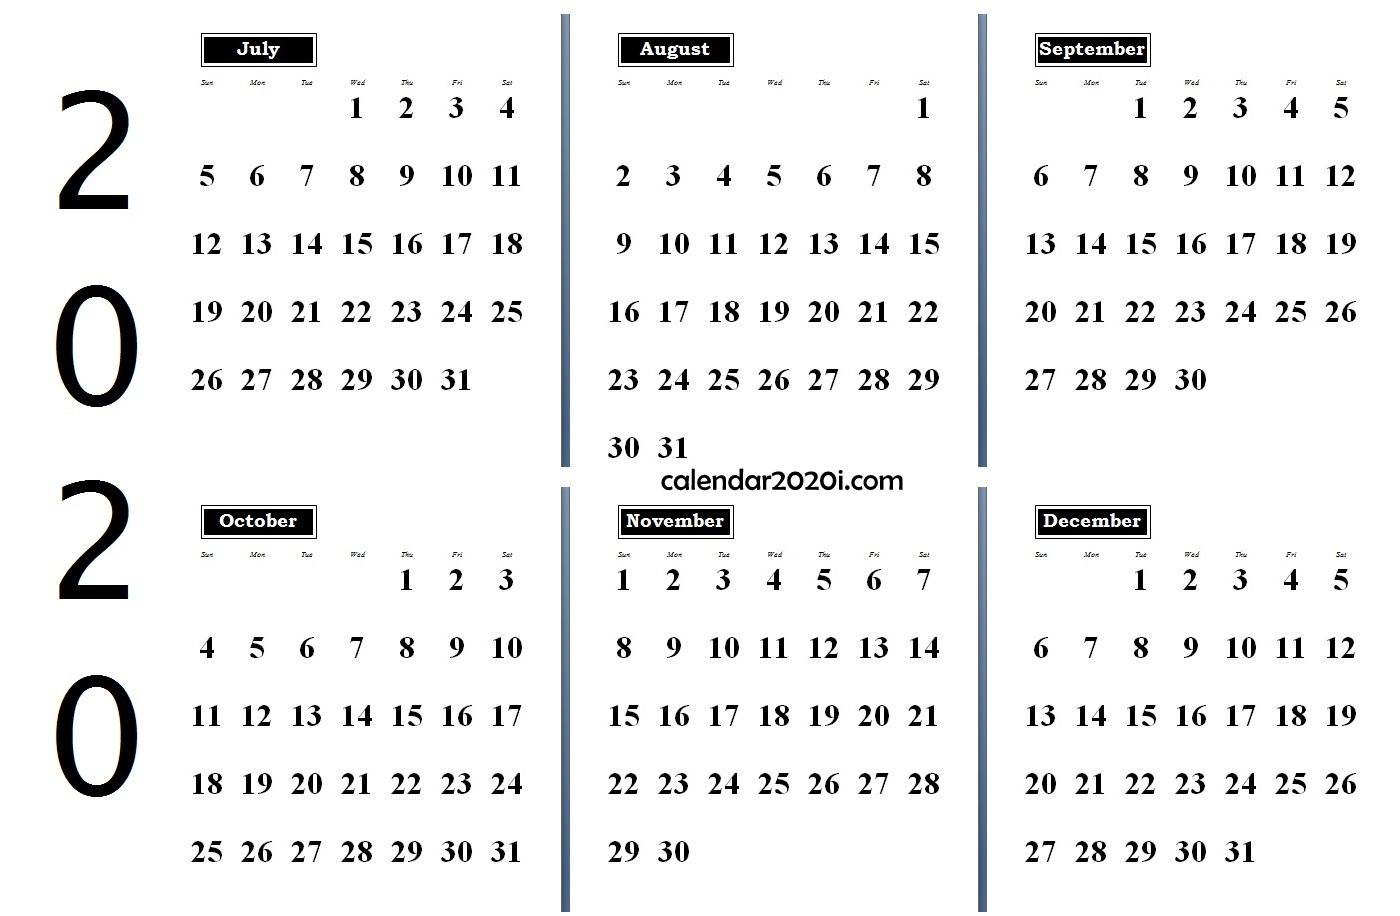 6 Months 2020 Half Year Printable Calendar | Calendar 2020 intended for Printable 6 Month Calendar